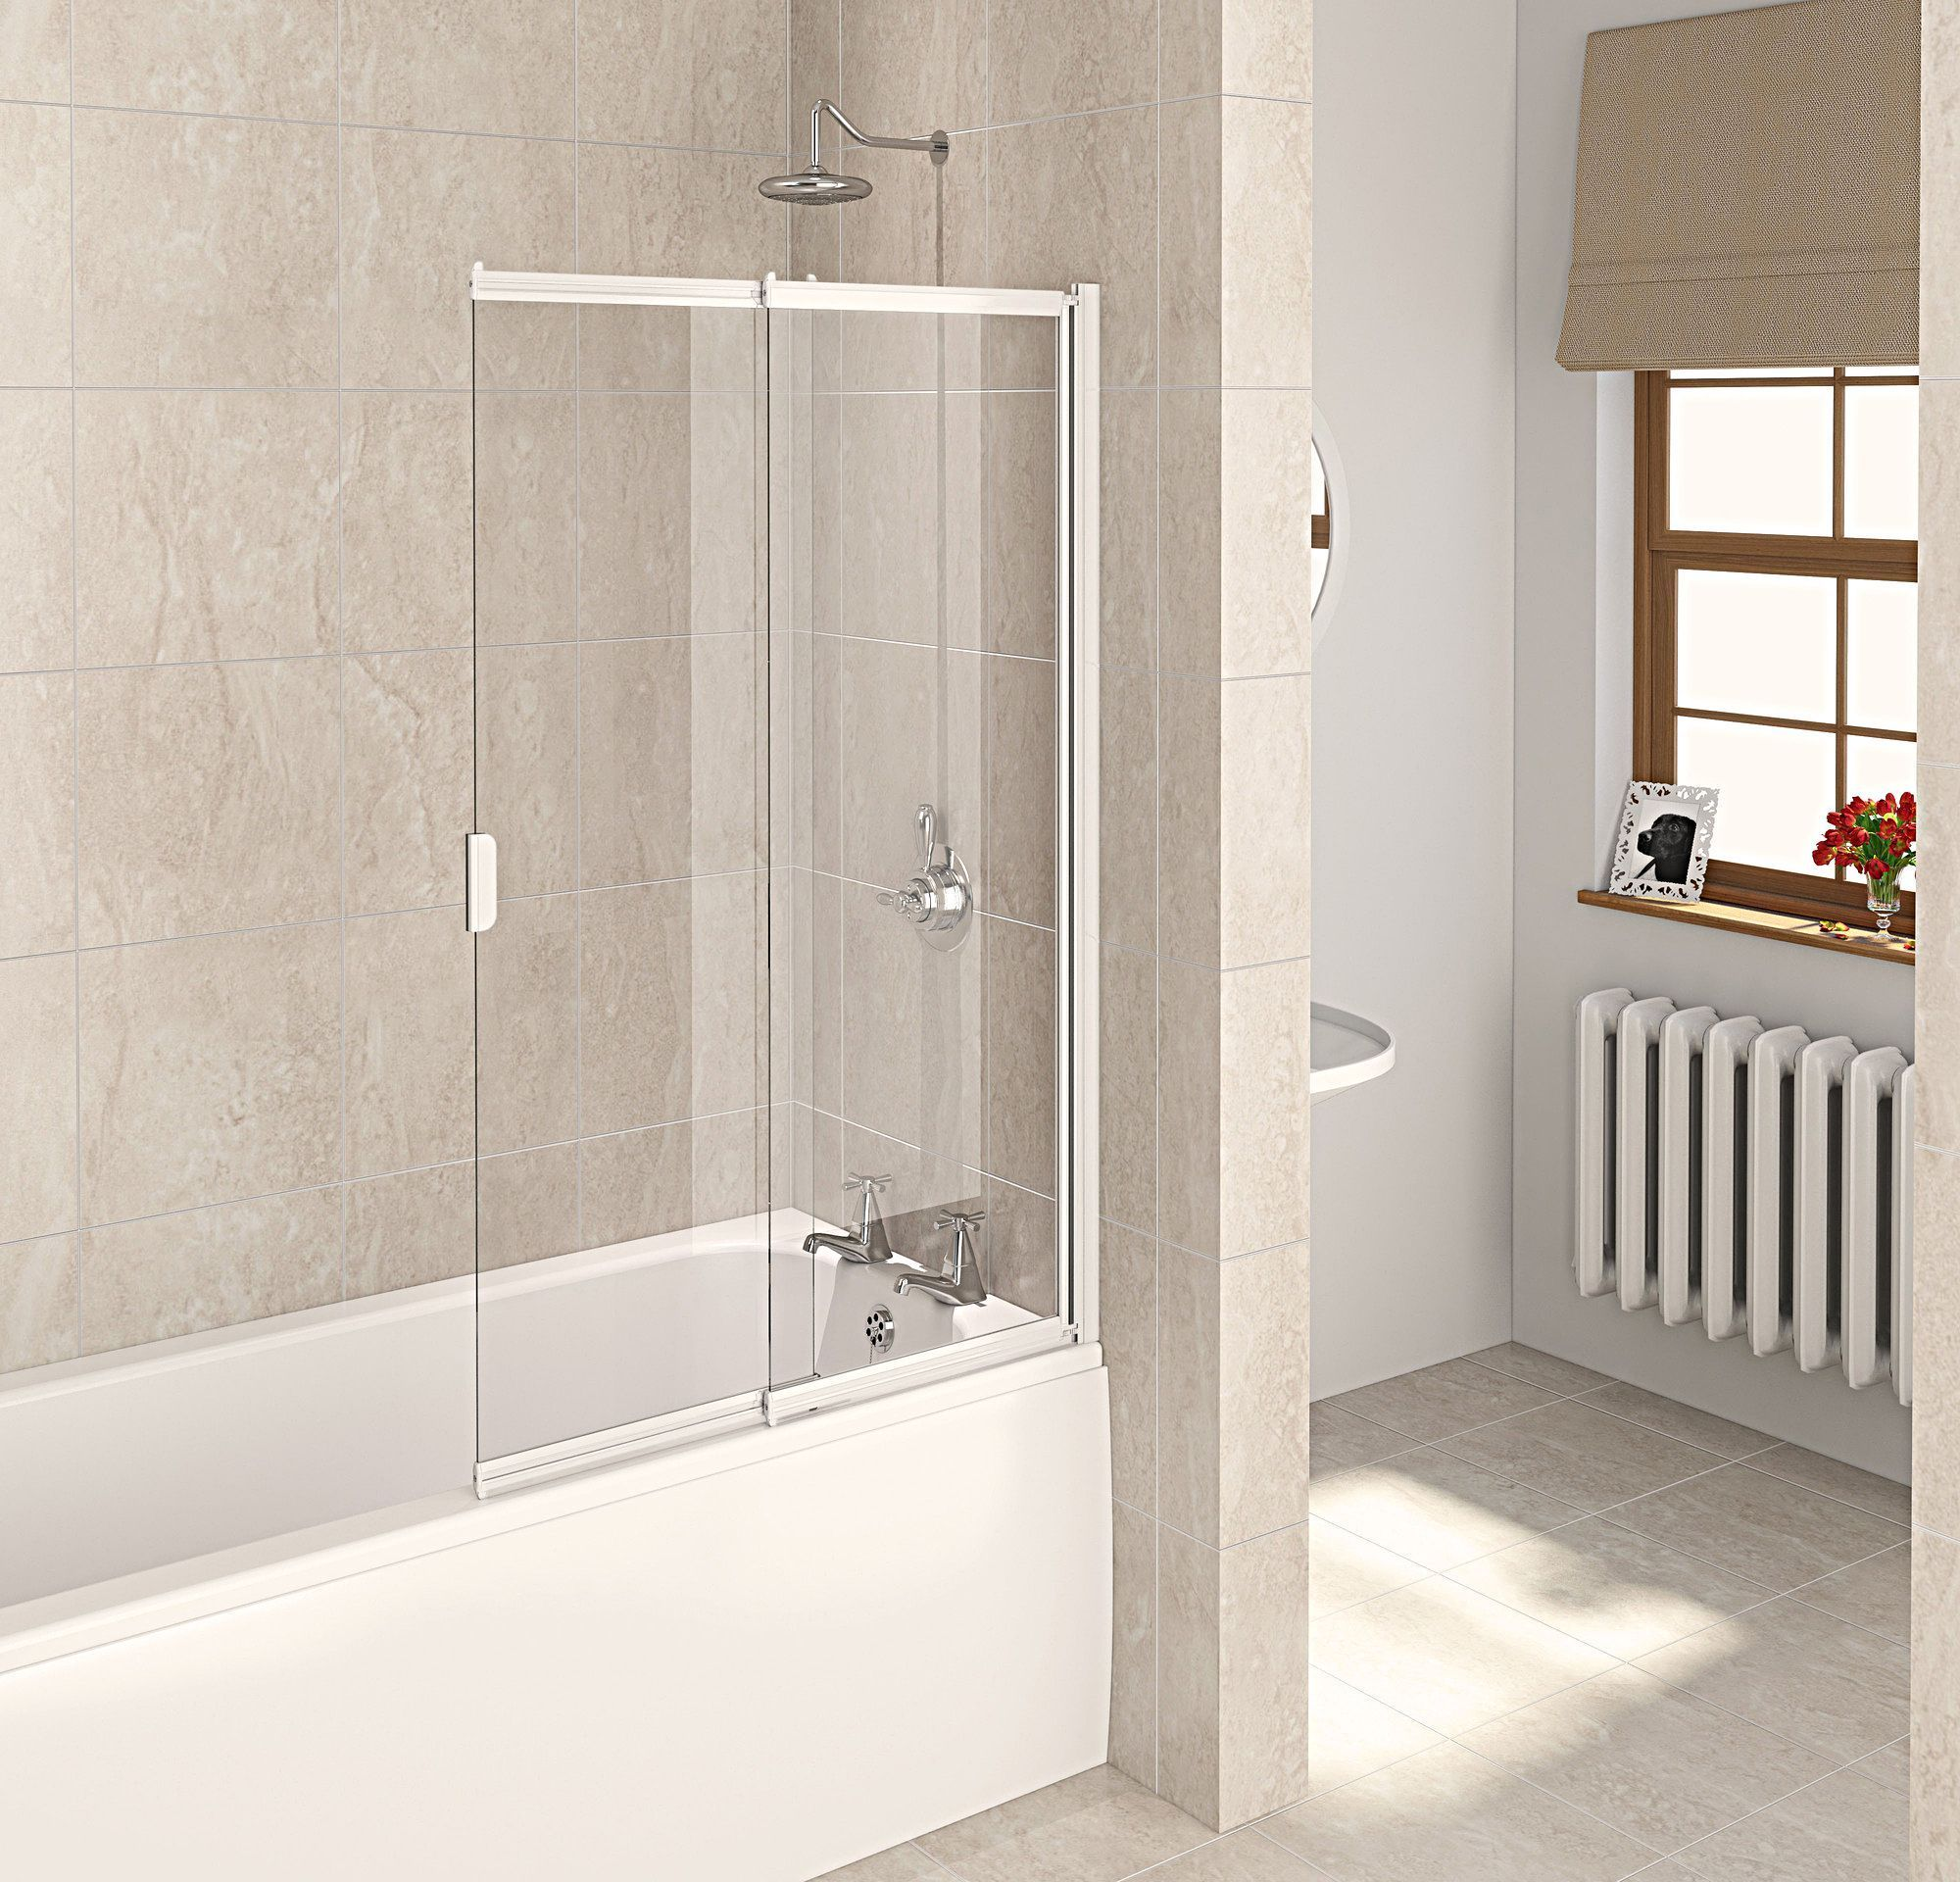 aqualux-white-aqua-4-clear-glass-2-panel-sliding-bath-shower-screen ...